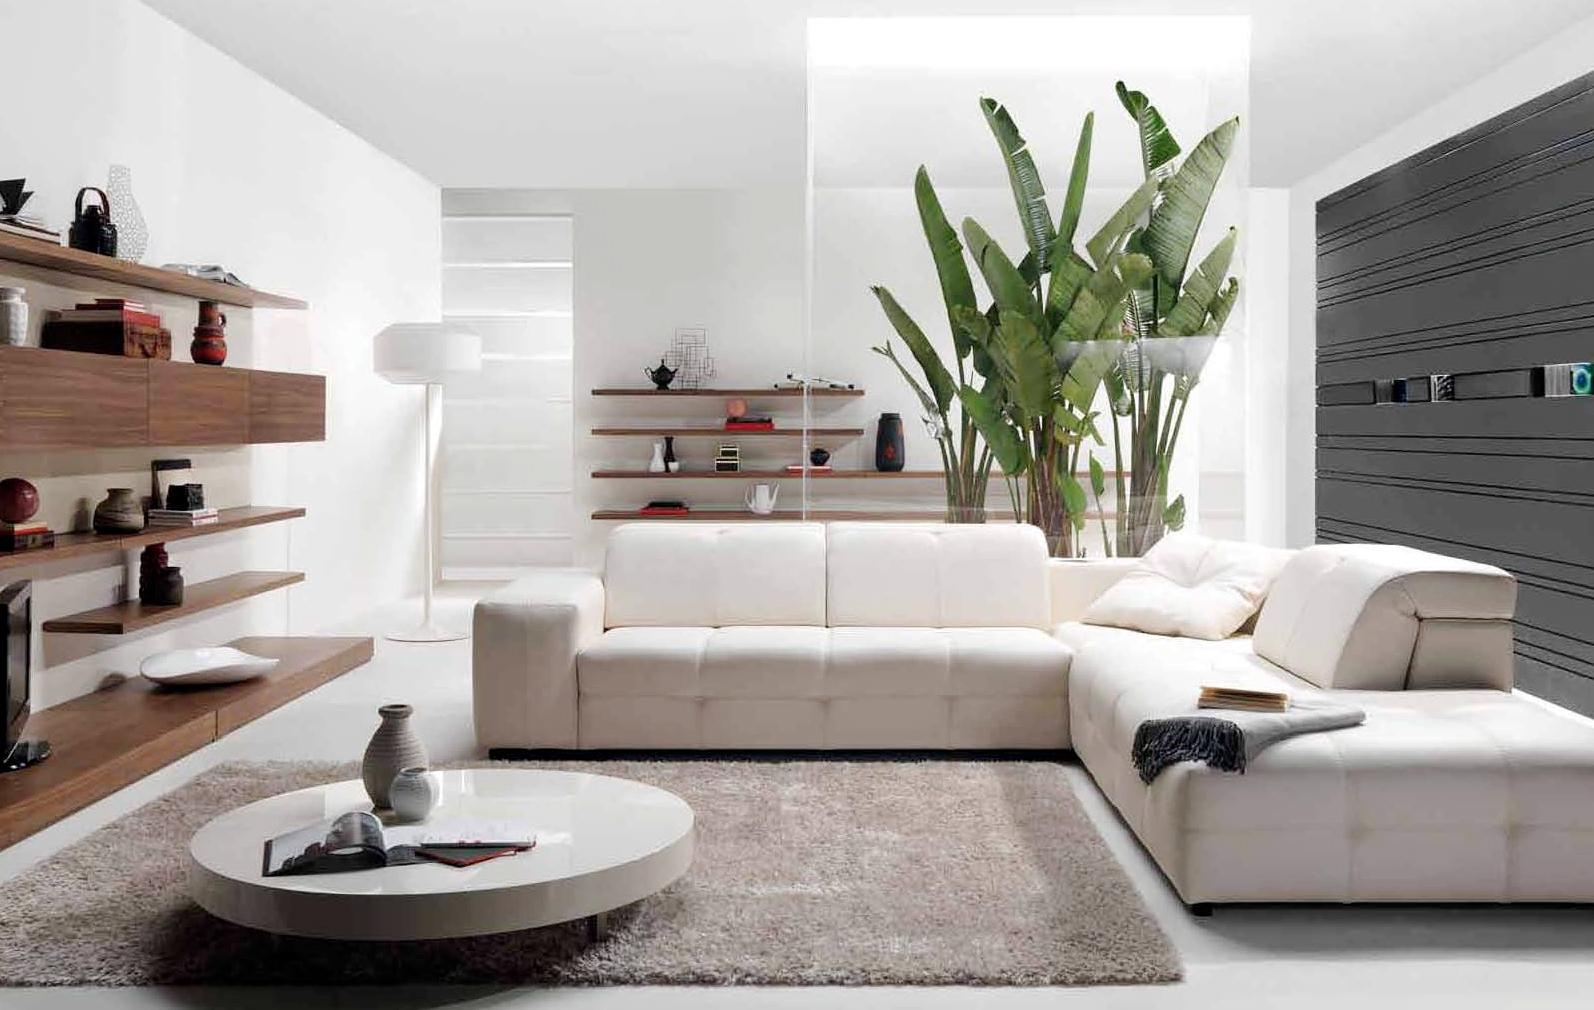 Interior Design Ideas, Interior Designs, Home Design Ideas: New Home Interior Design Ideas